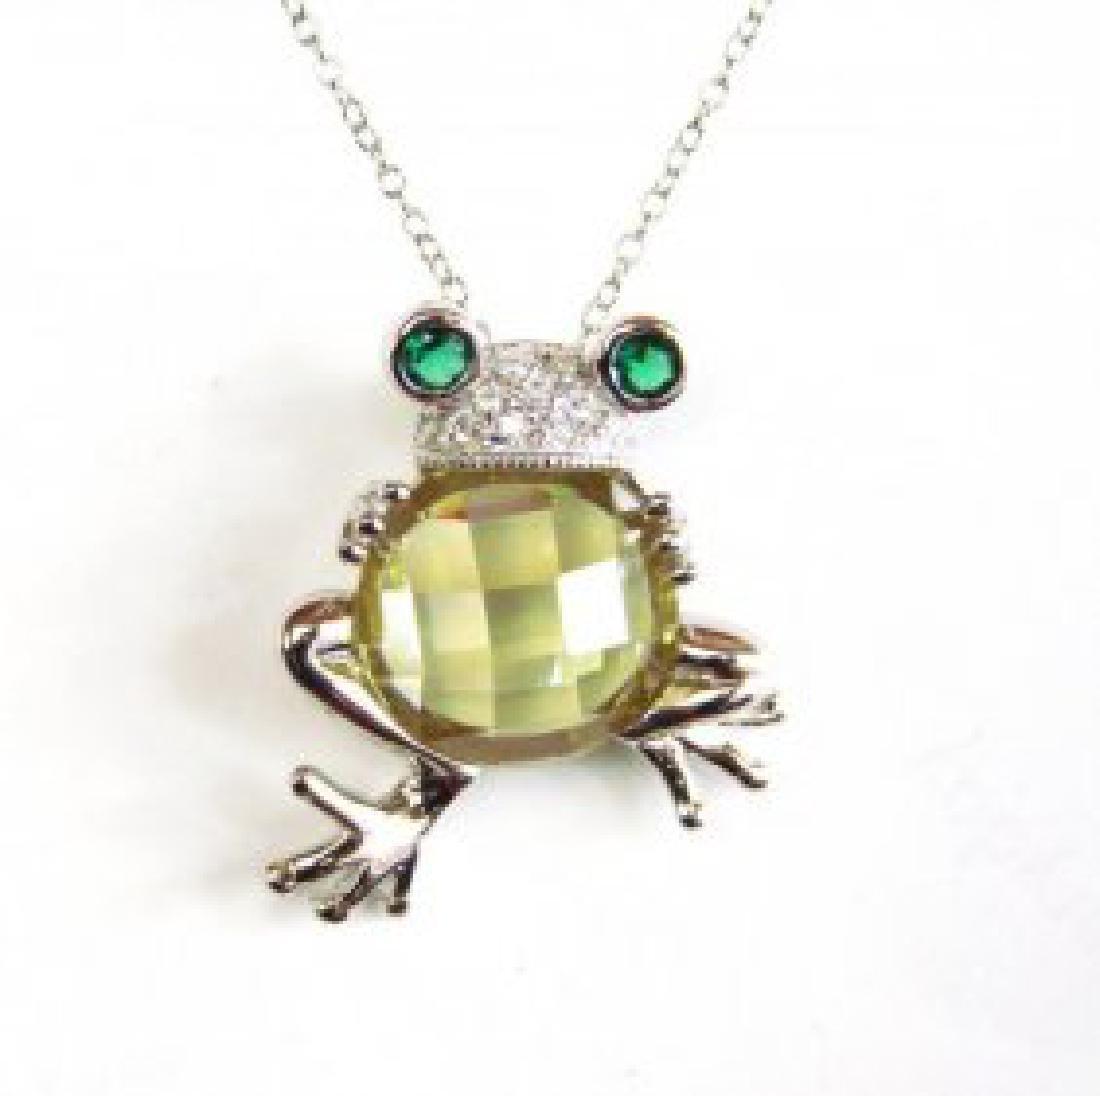 Creation Diamond/Limon Topaz/Emerald 6.10Ct 18k W/g